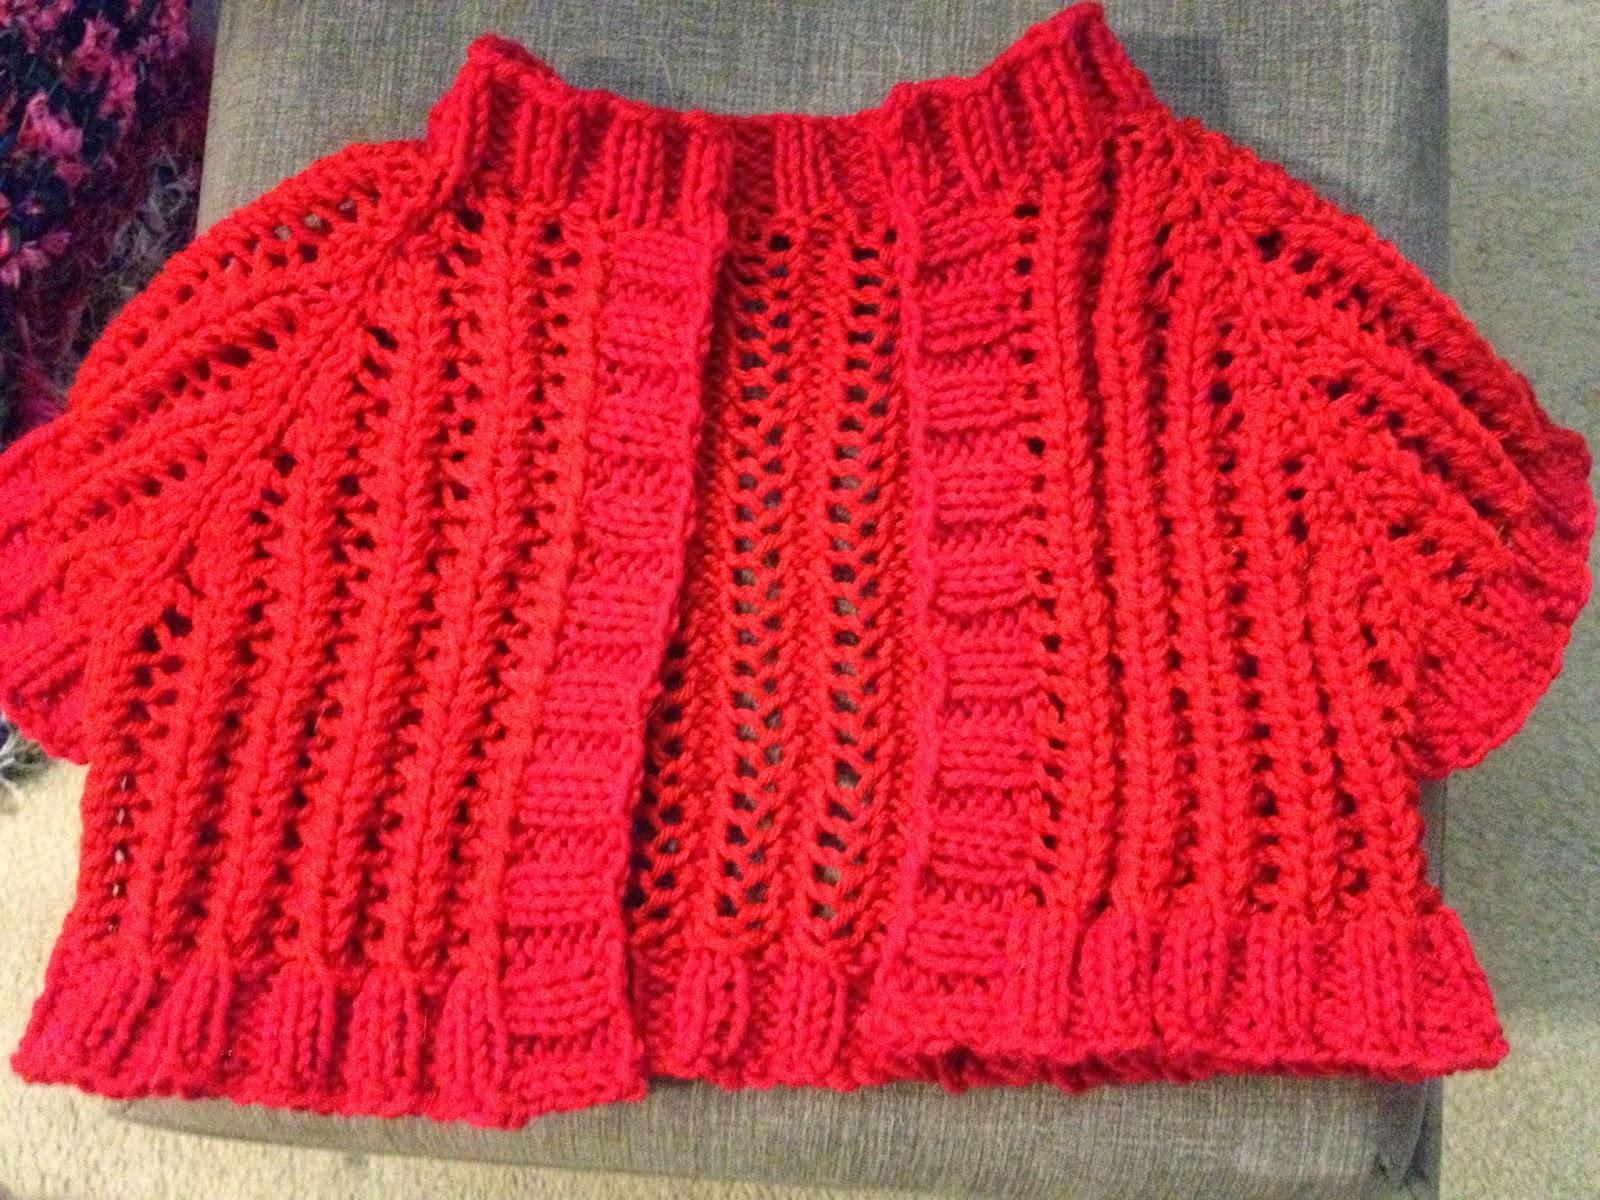 Bolero Knitting Pattern : Camys Loft: Lacy Red Bolero knit pattern